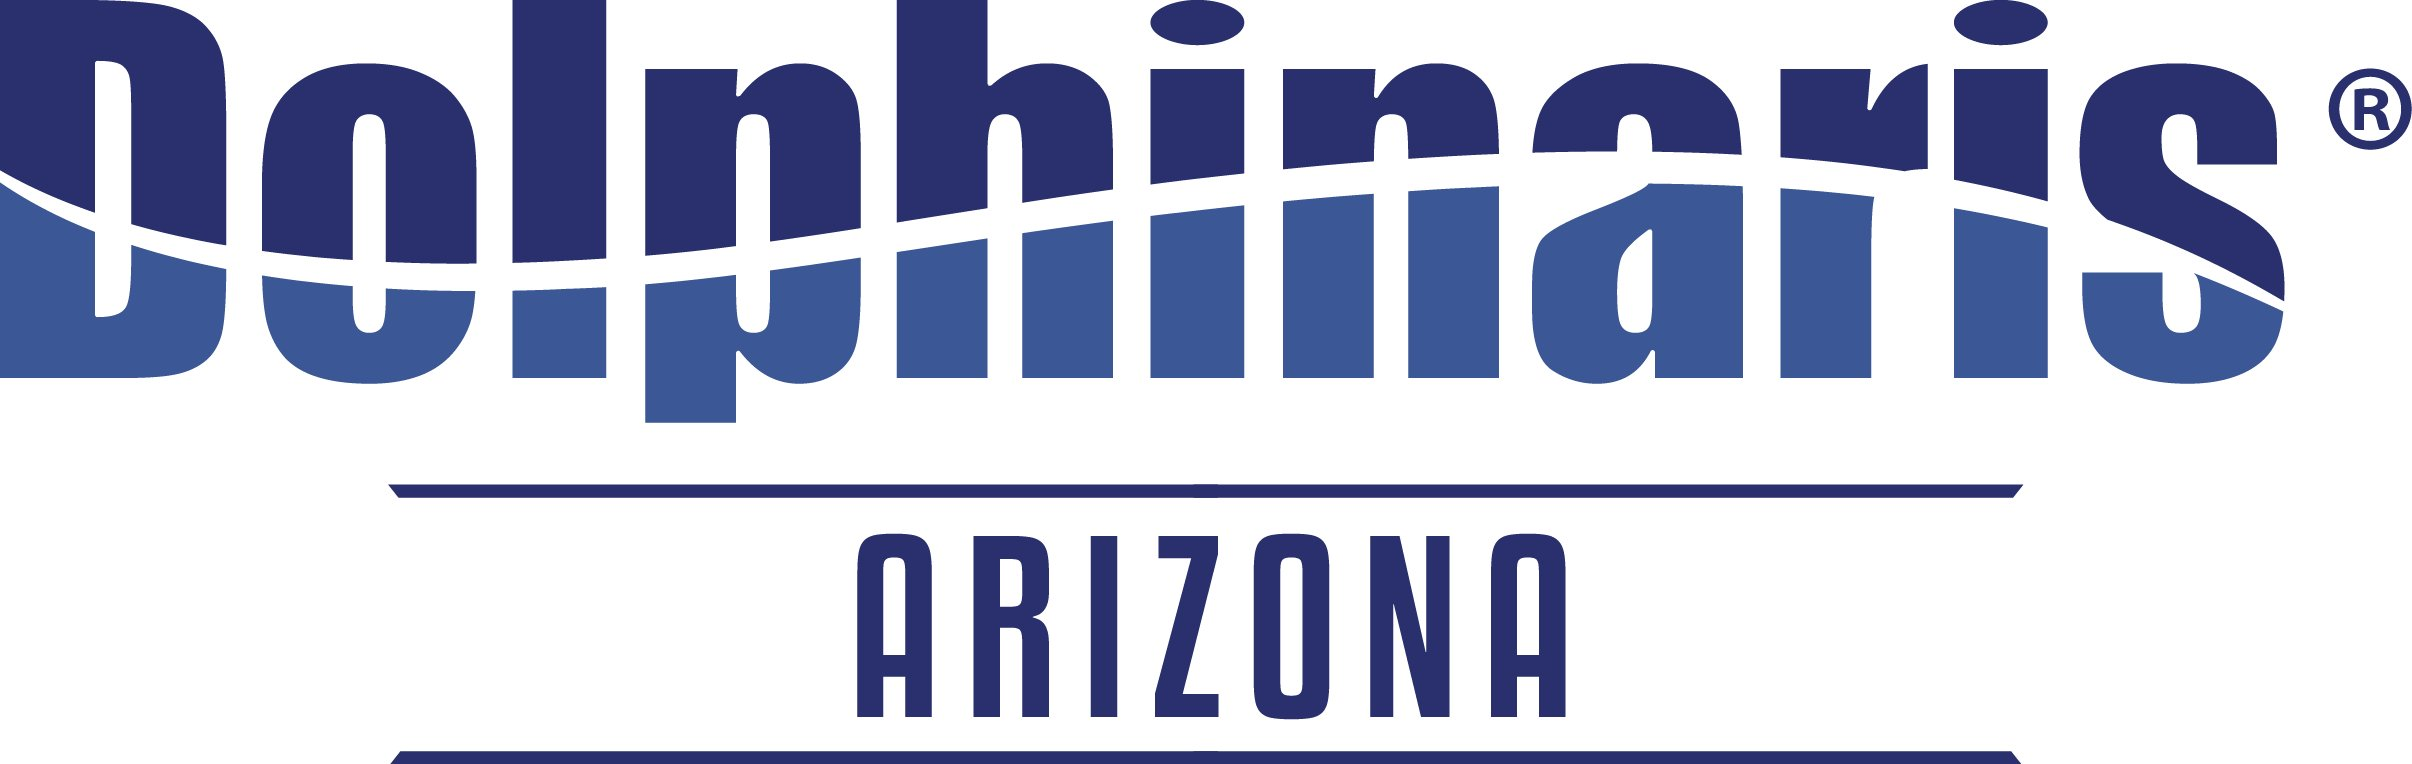 dolphinarisaz-logo-png-192334-original